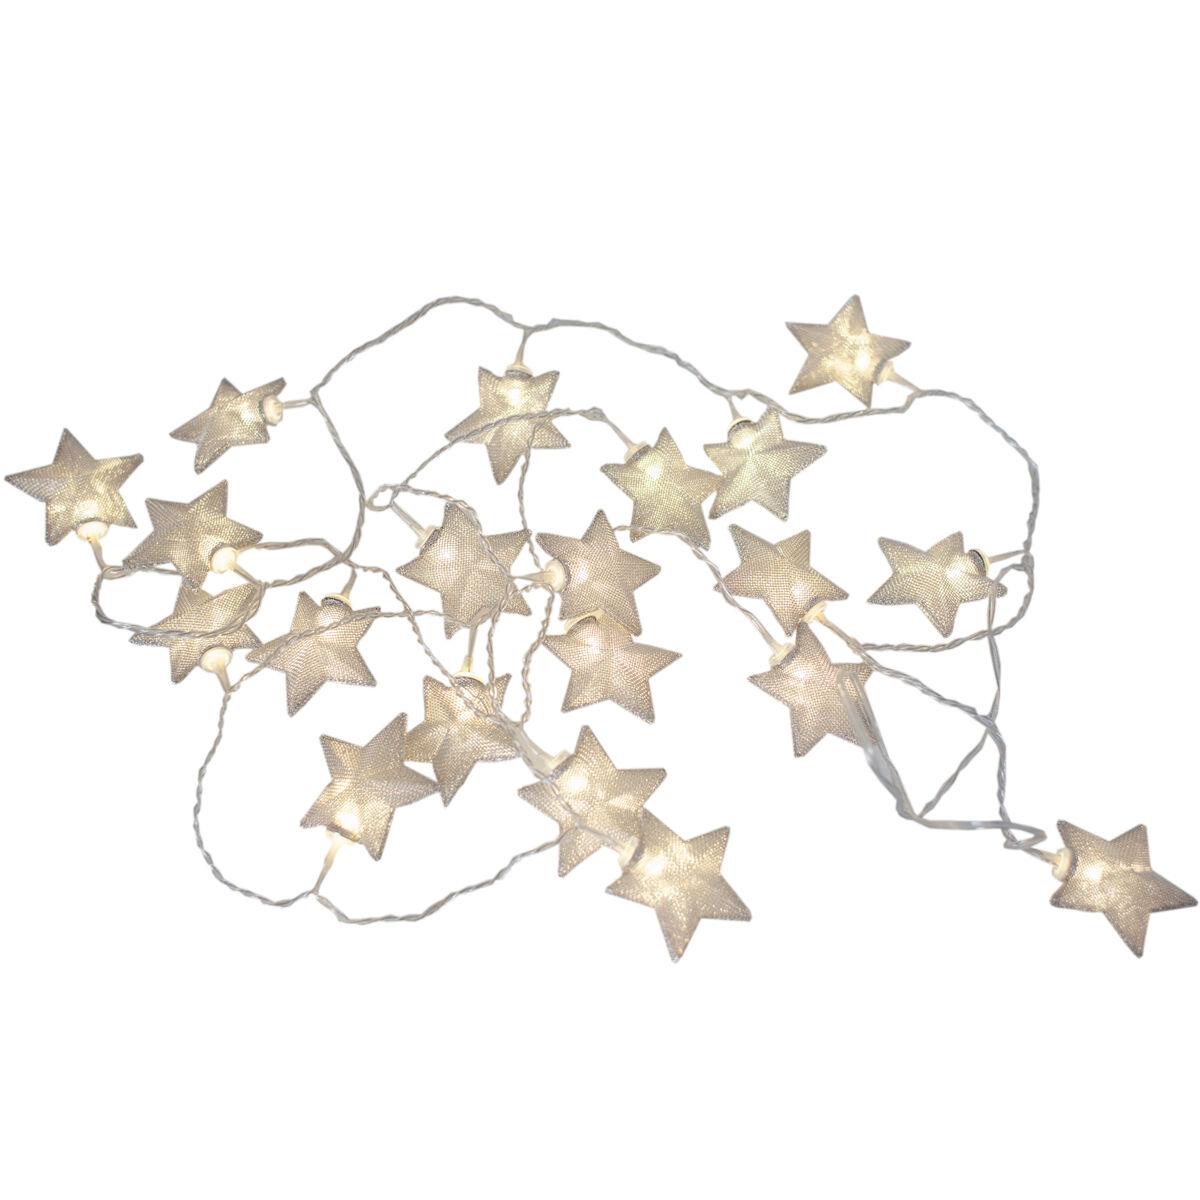 Rydéns By Rydéns Saint Star LED Valosarja,Kulta, 2m